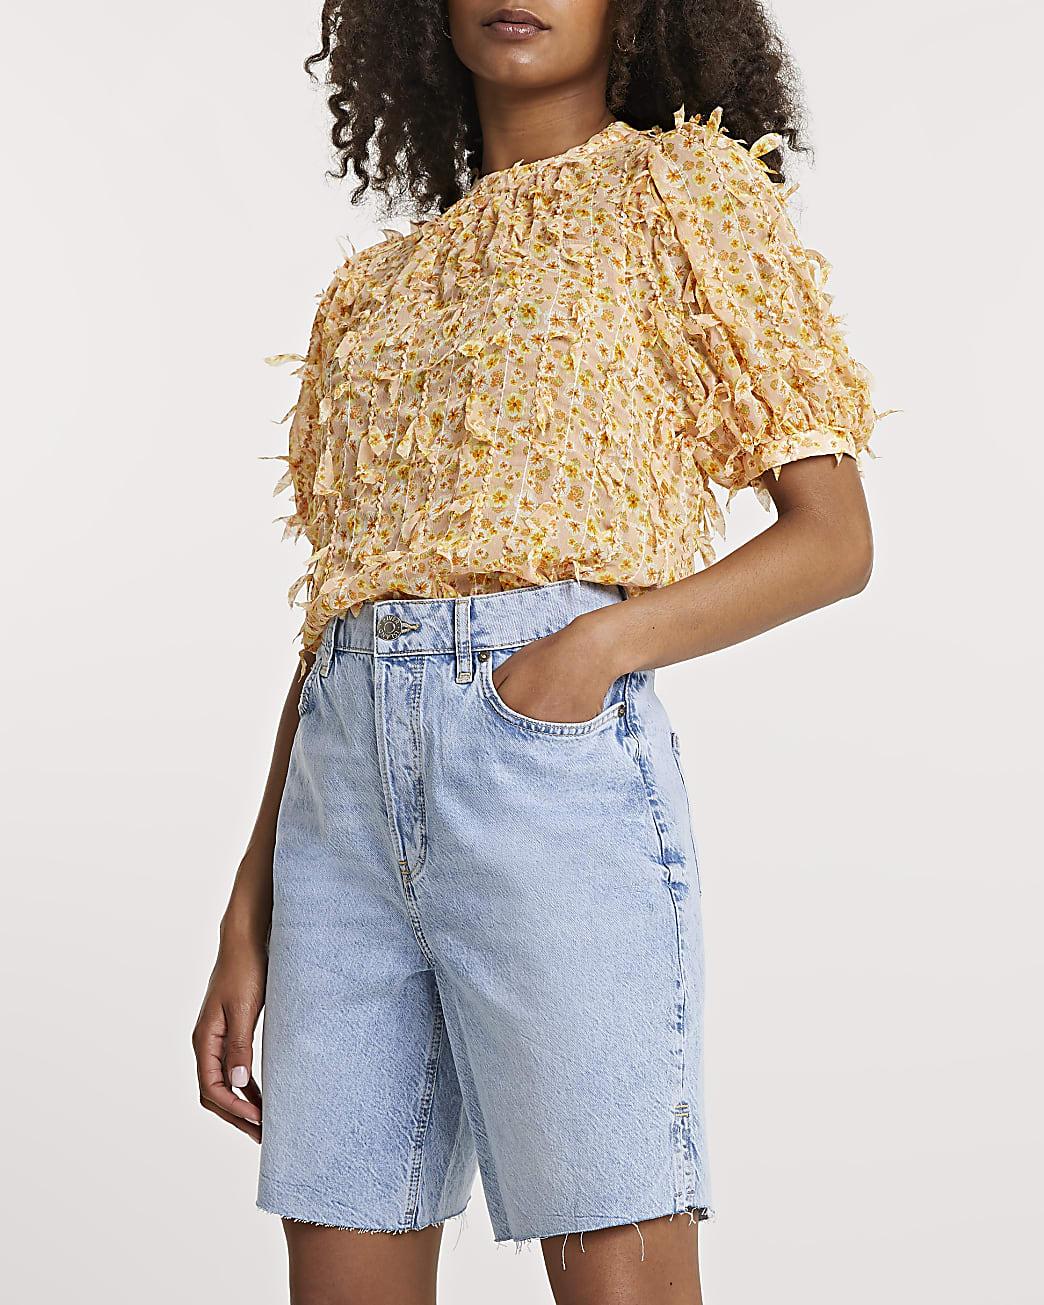 Orange short sleeve textured top